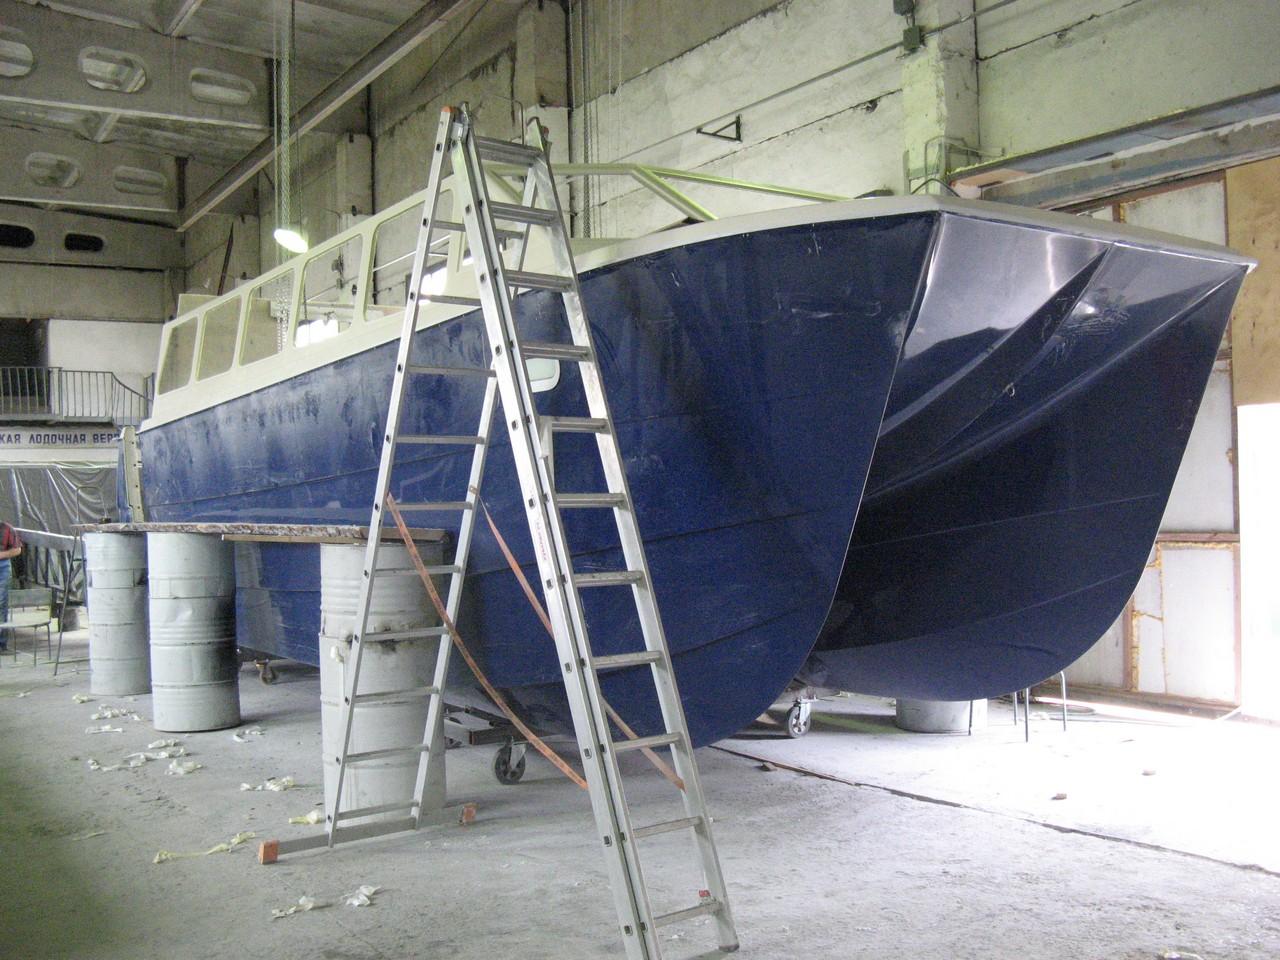 изготовление лодок в пскове